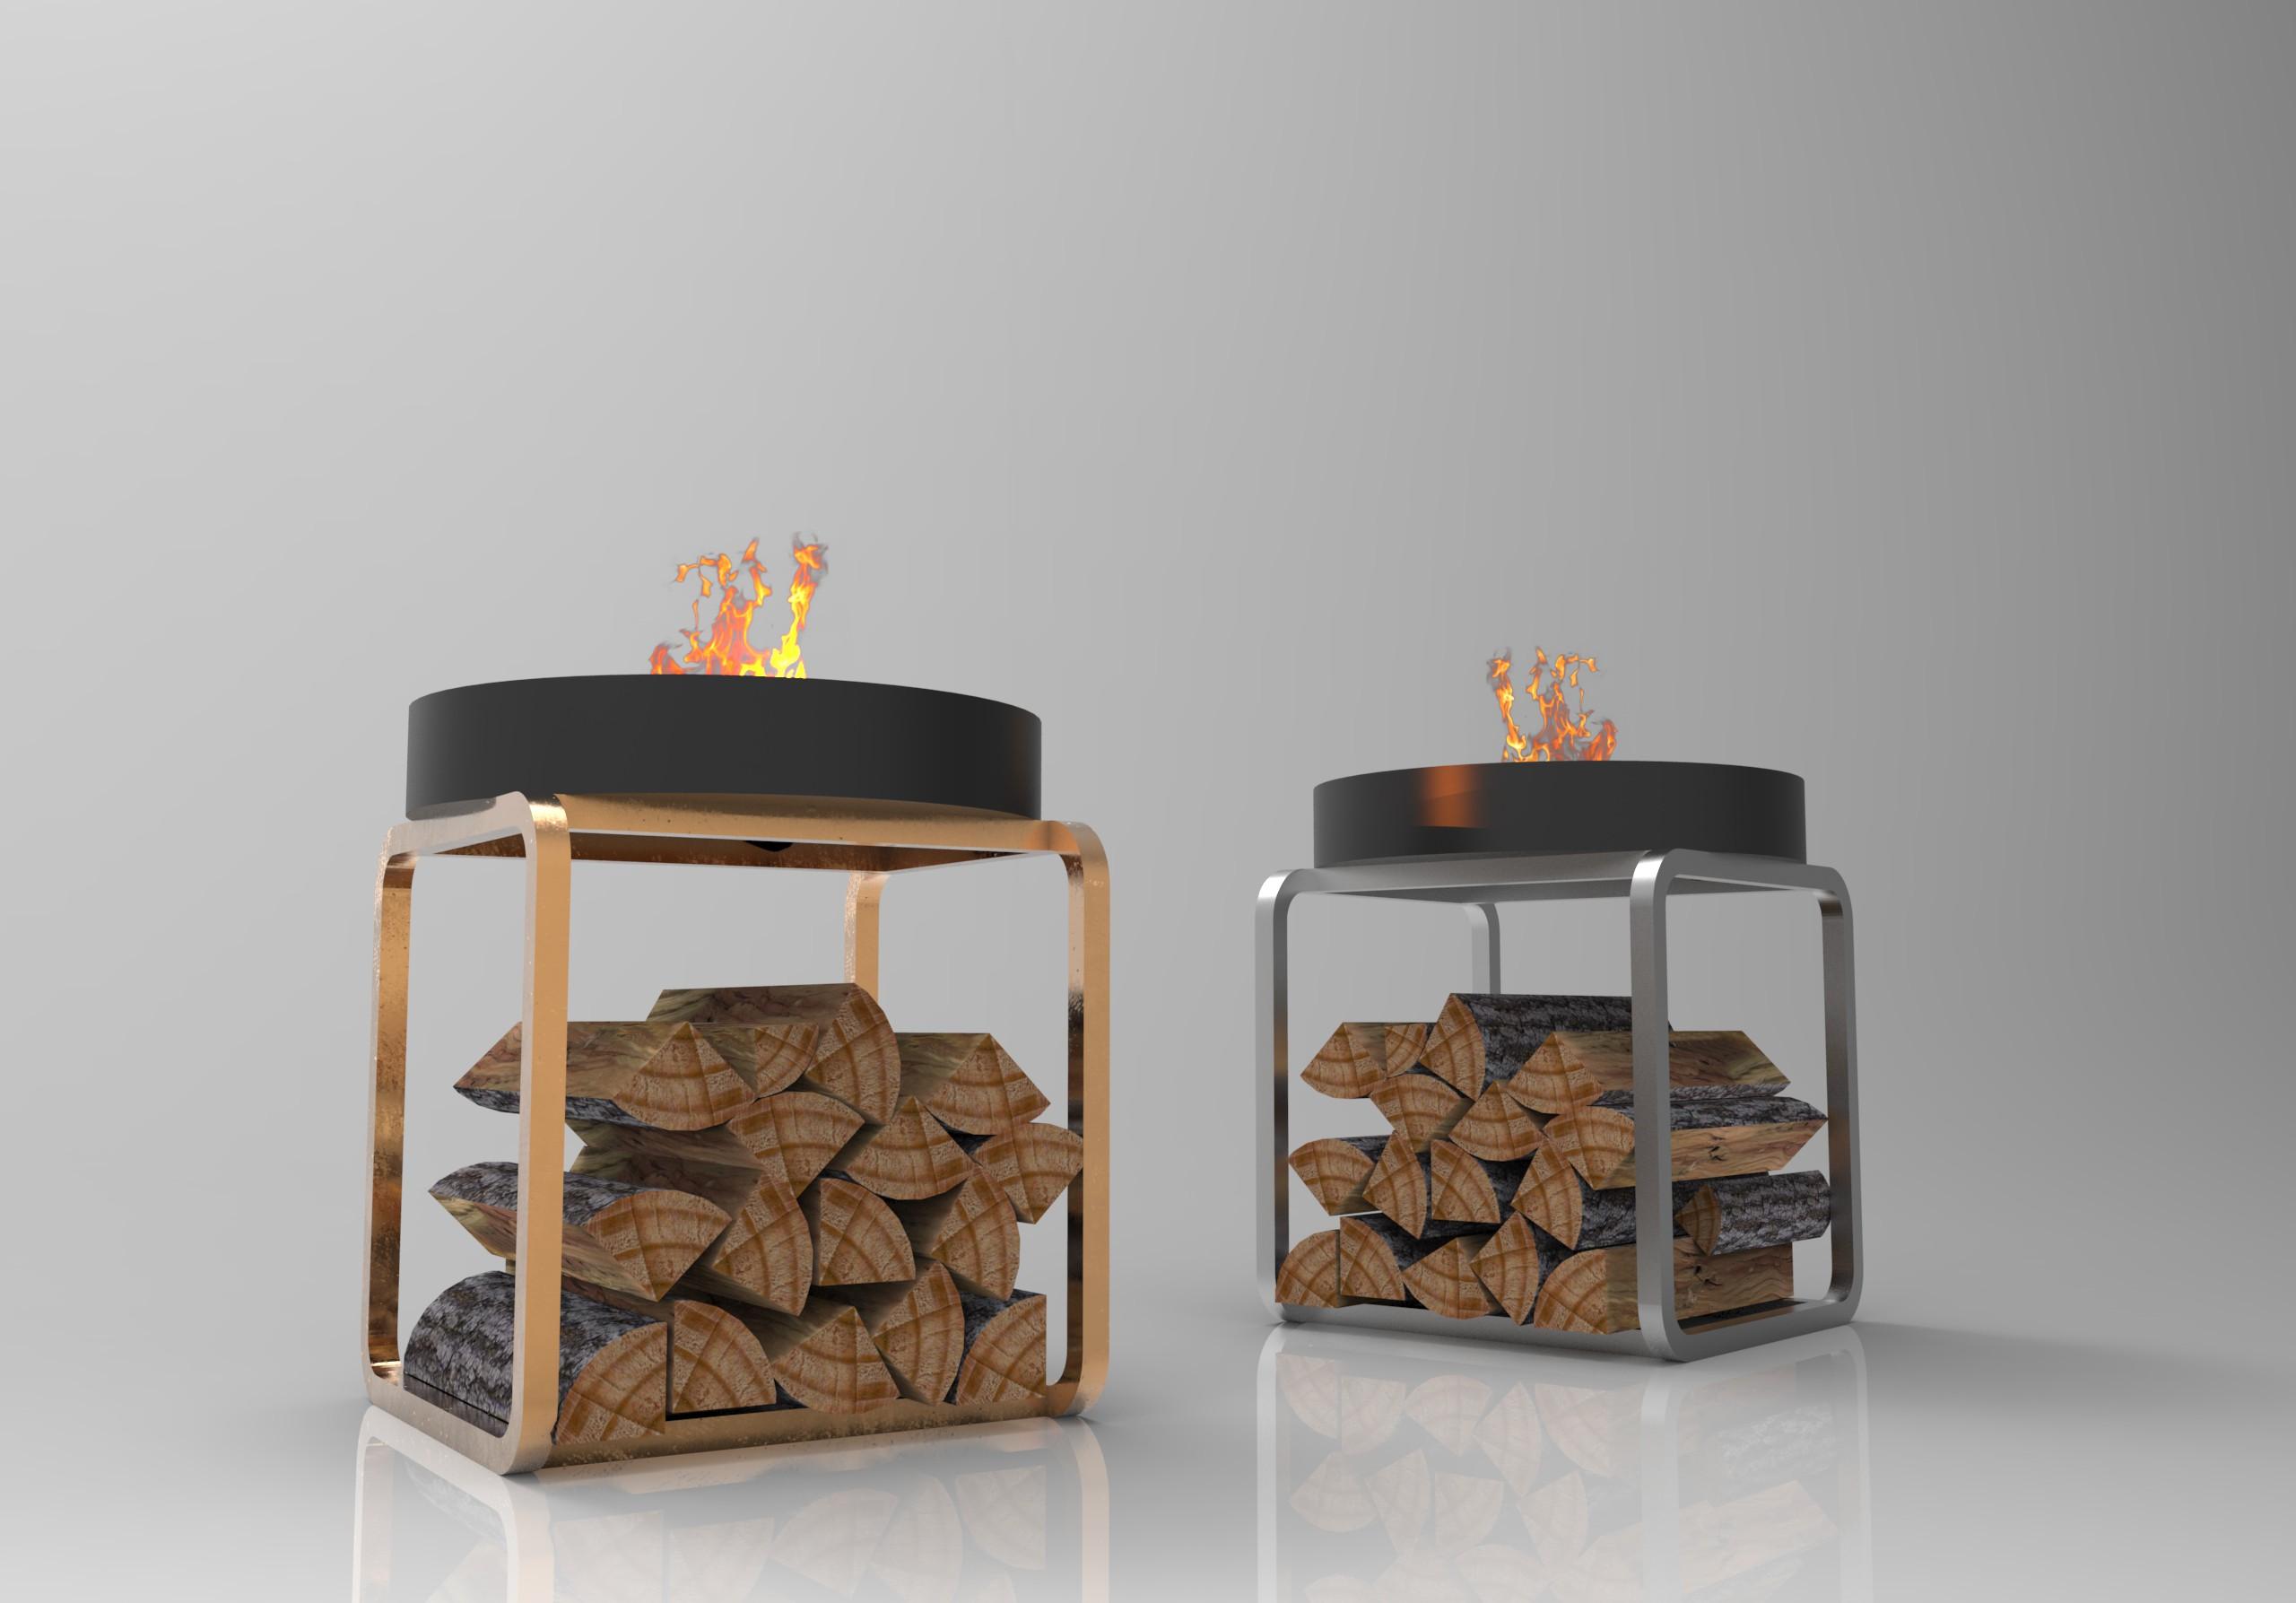 Firebowl and Log holders